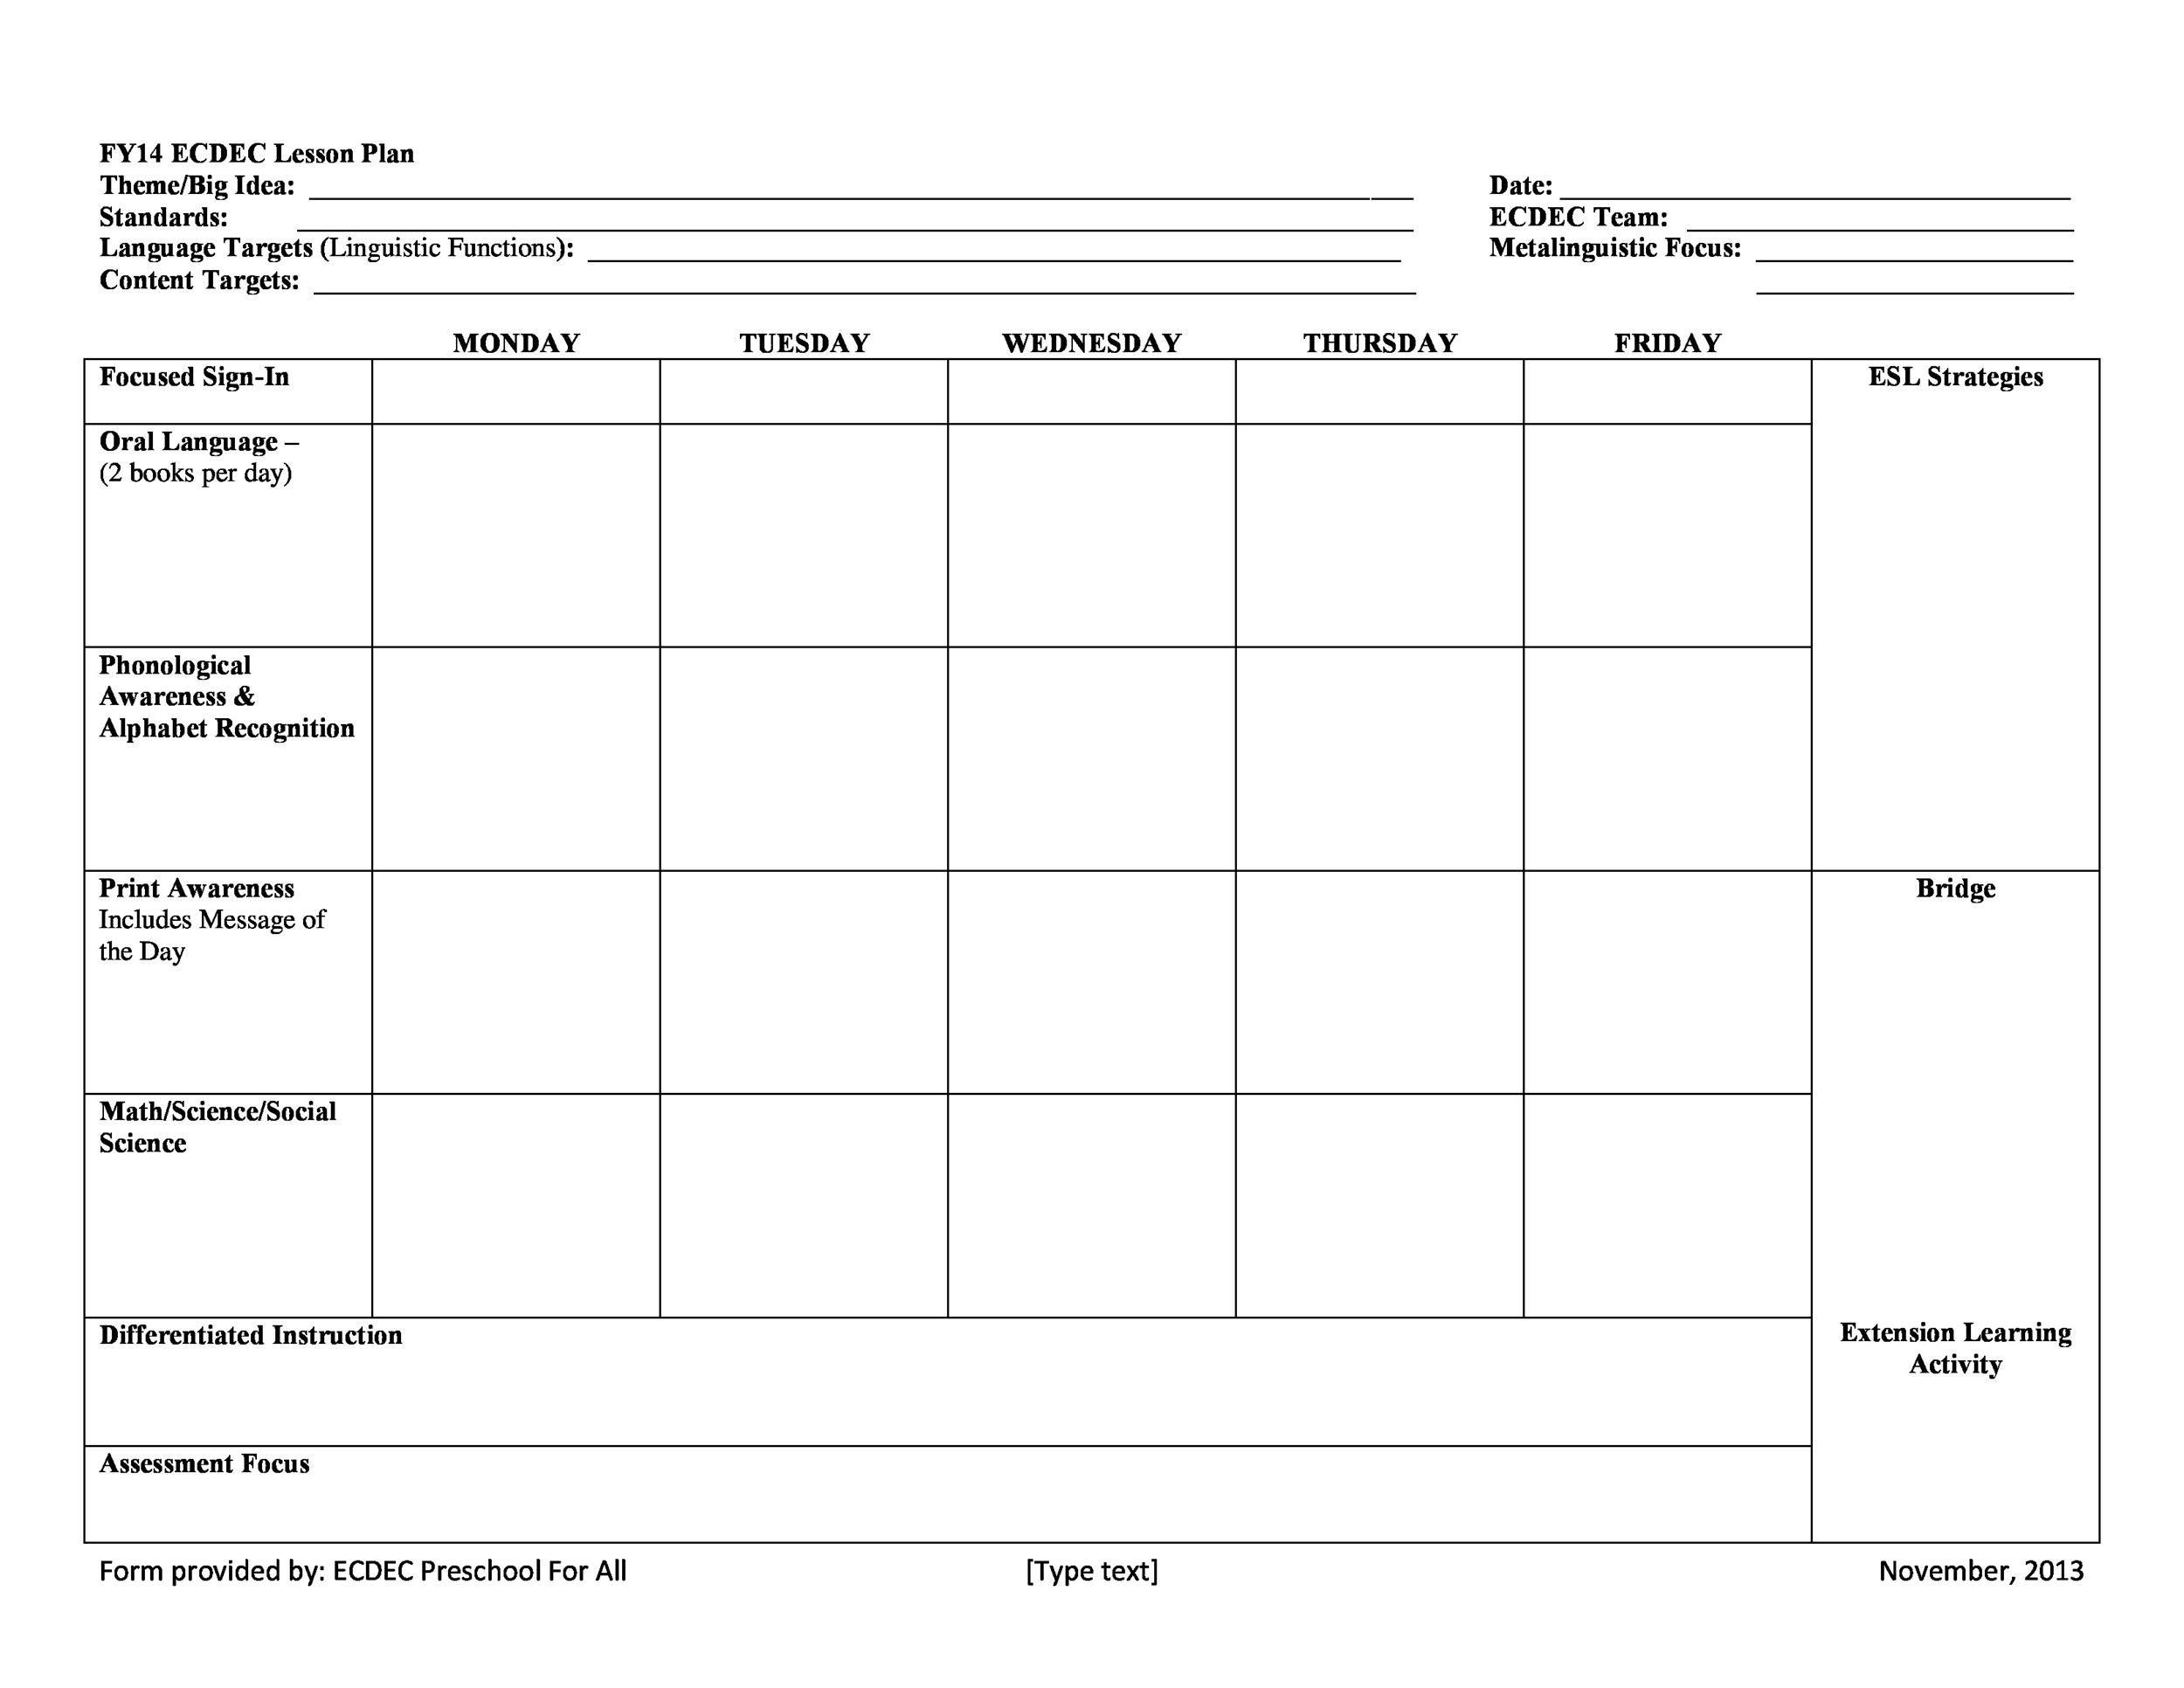 004 Unusual Printable Lesson Plan Template Weekly High Definition  Blank Pdf Monthly Free PreschoolFull